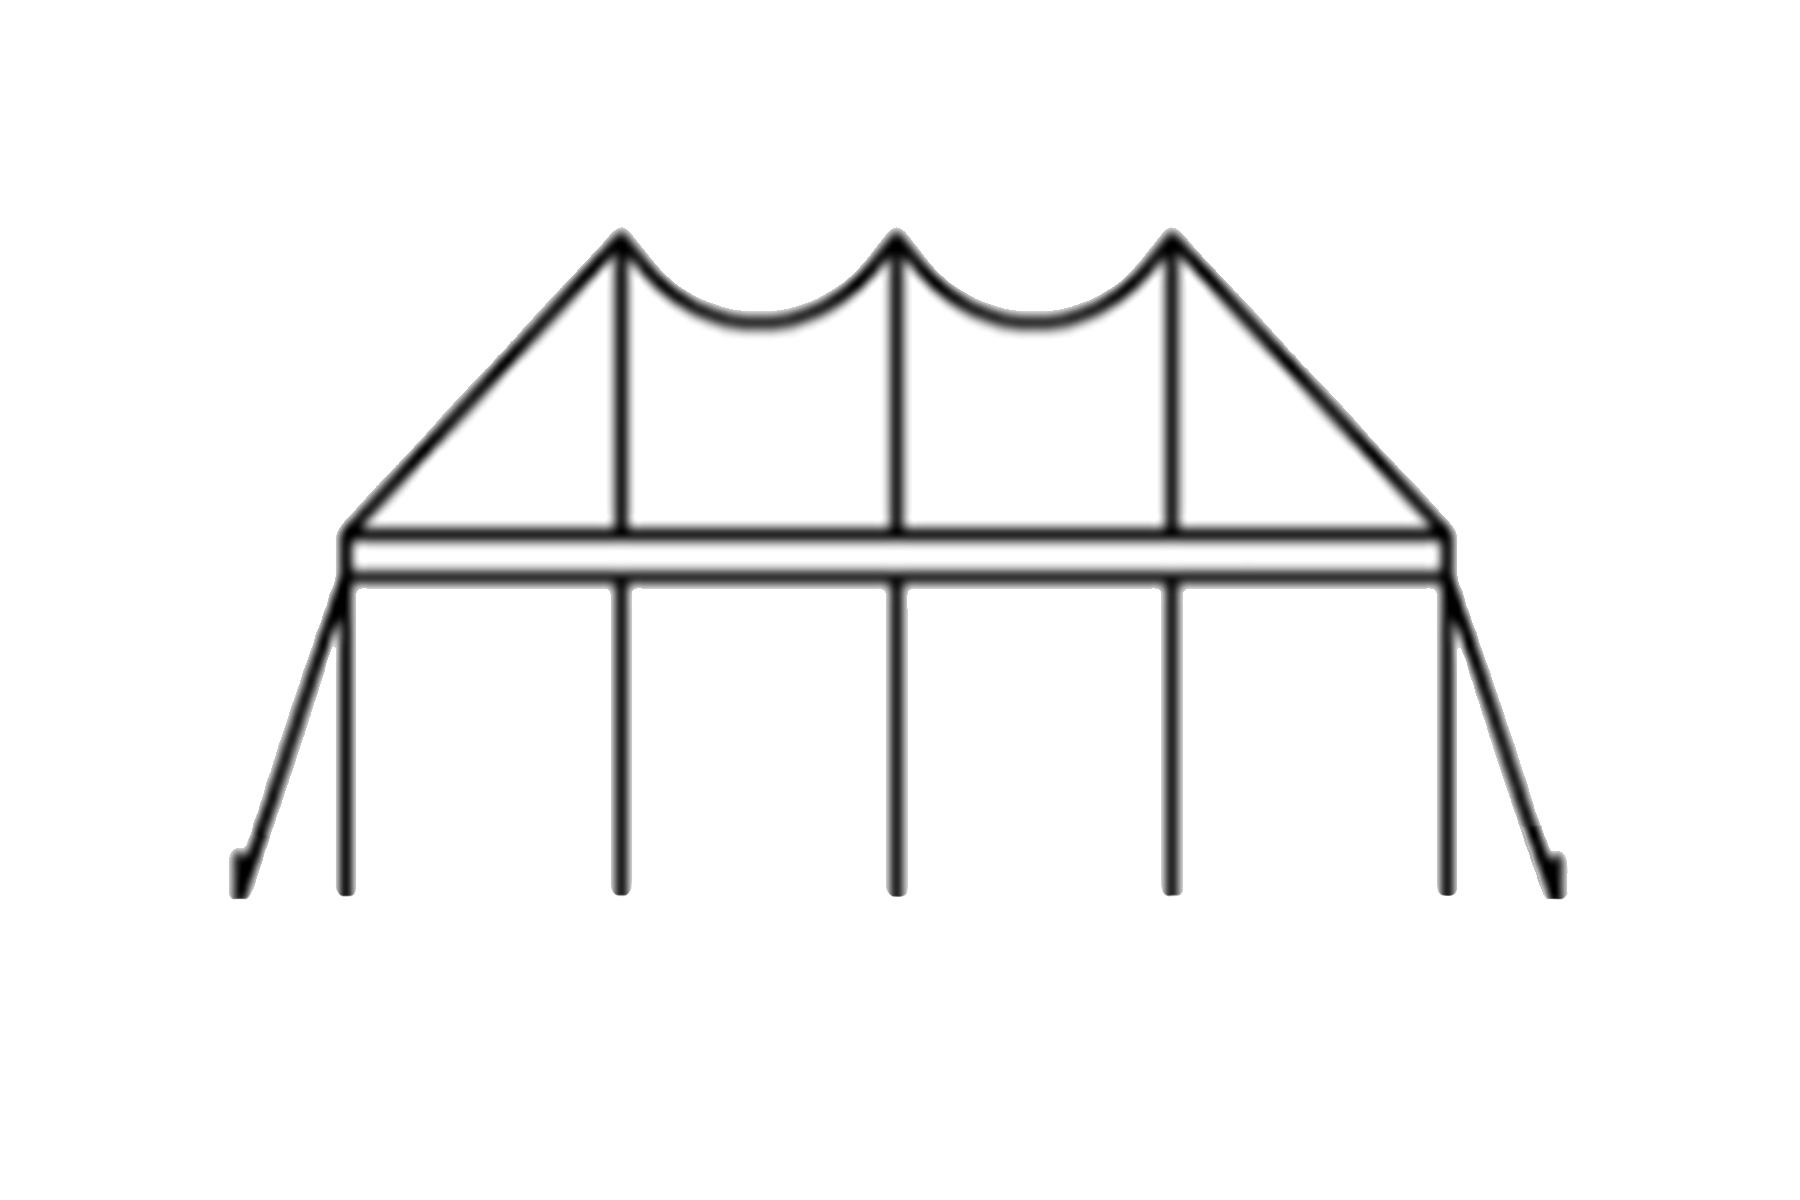 60 x 60 Pole Tent